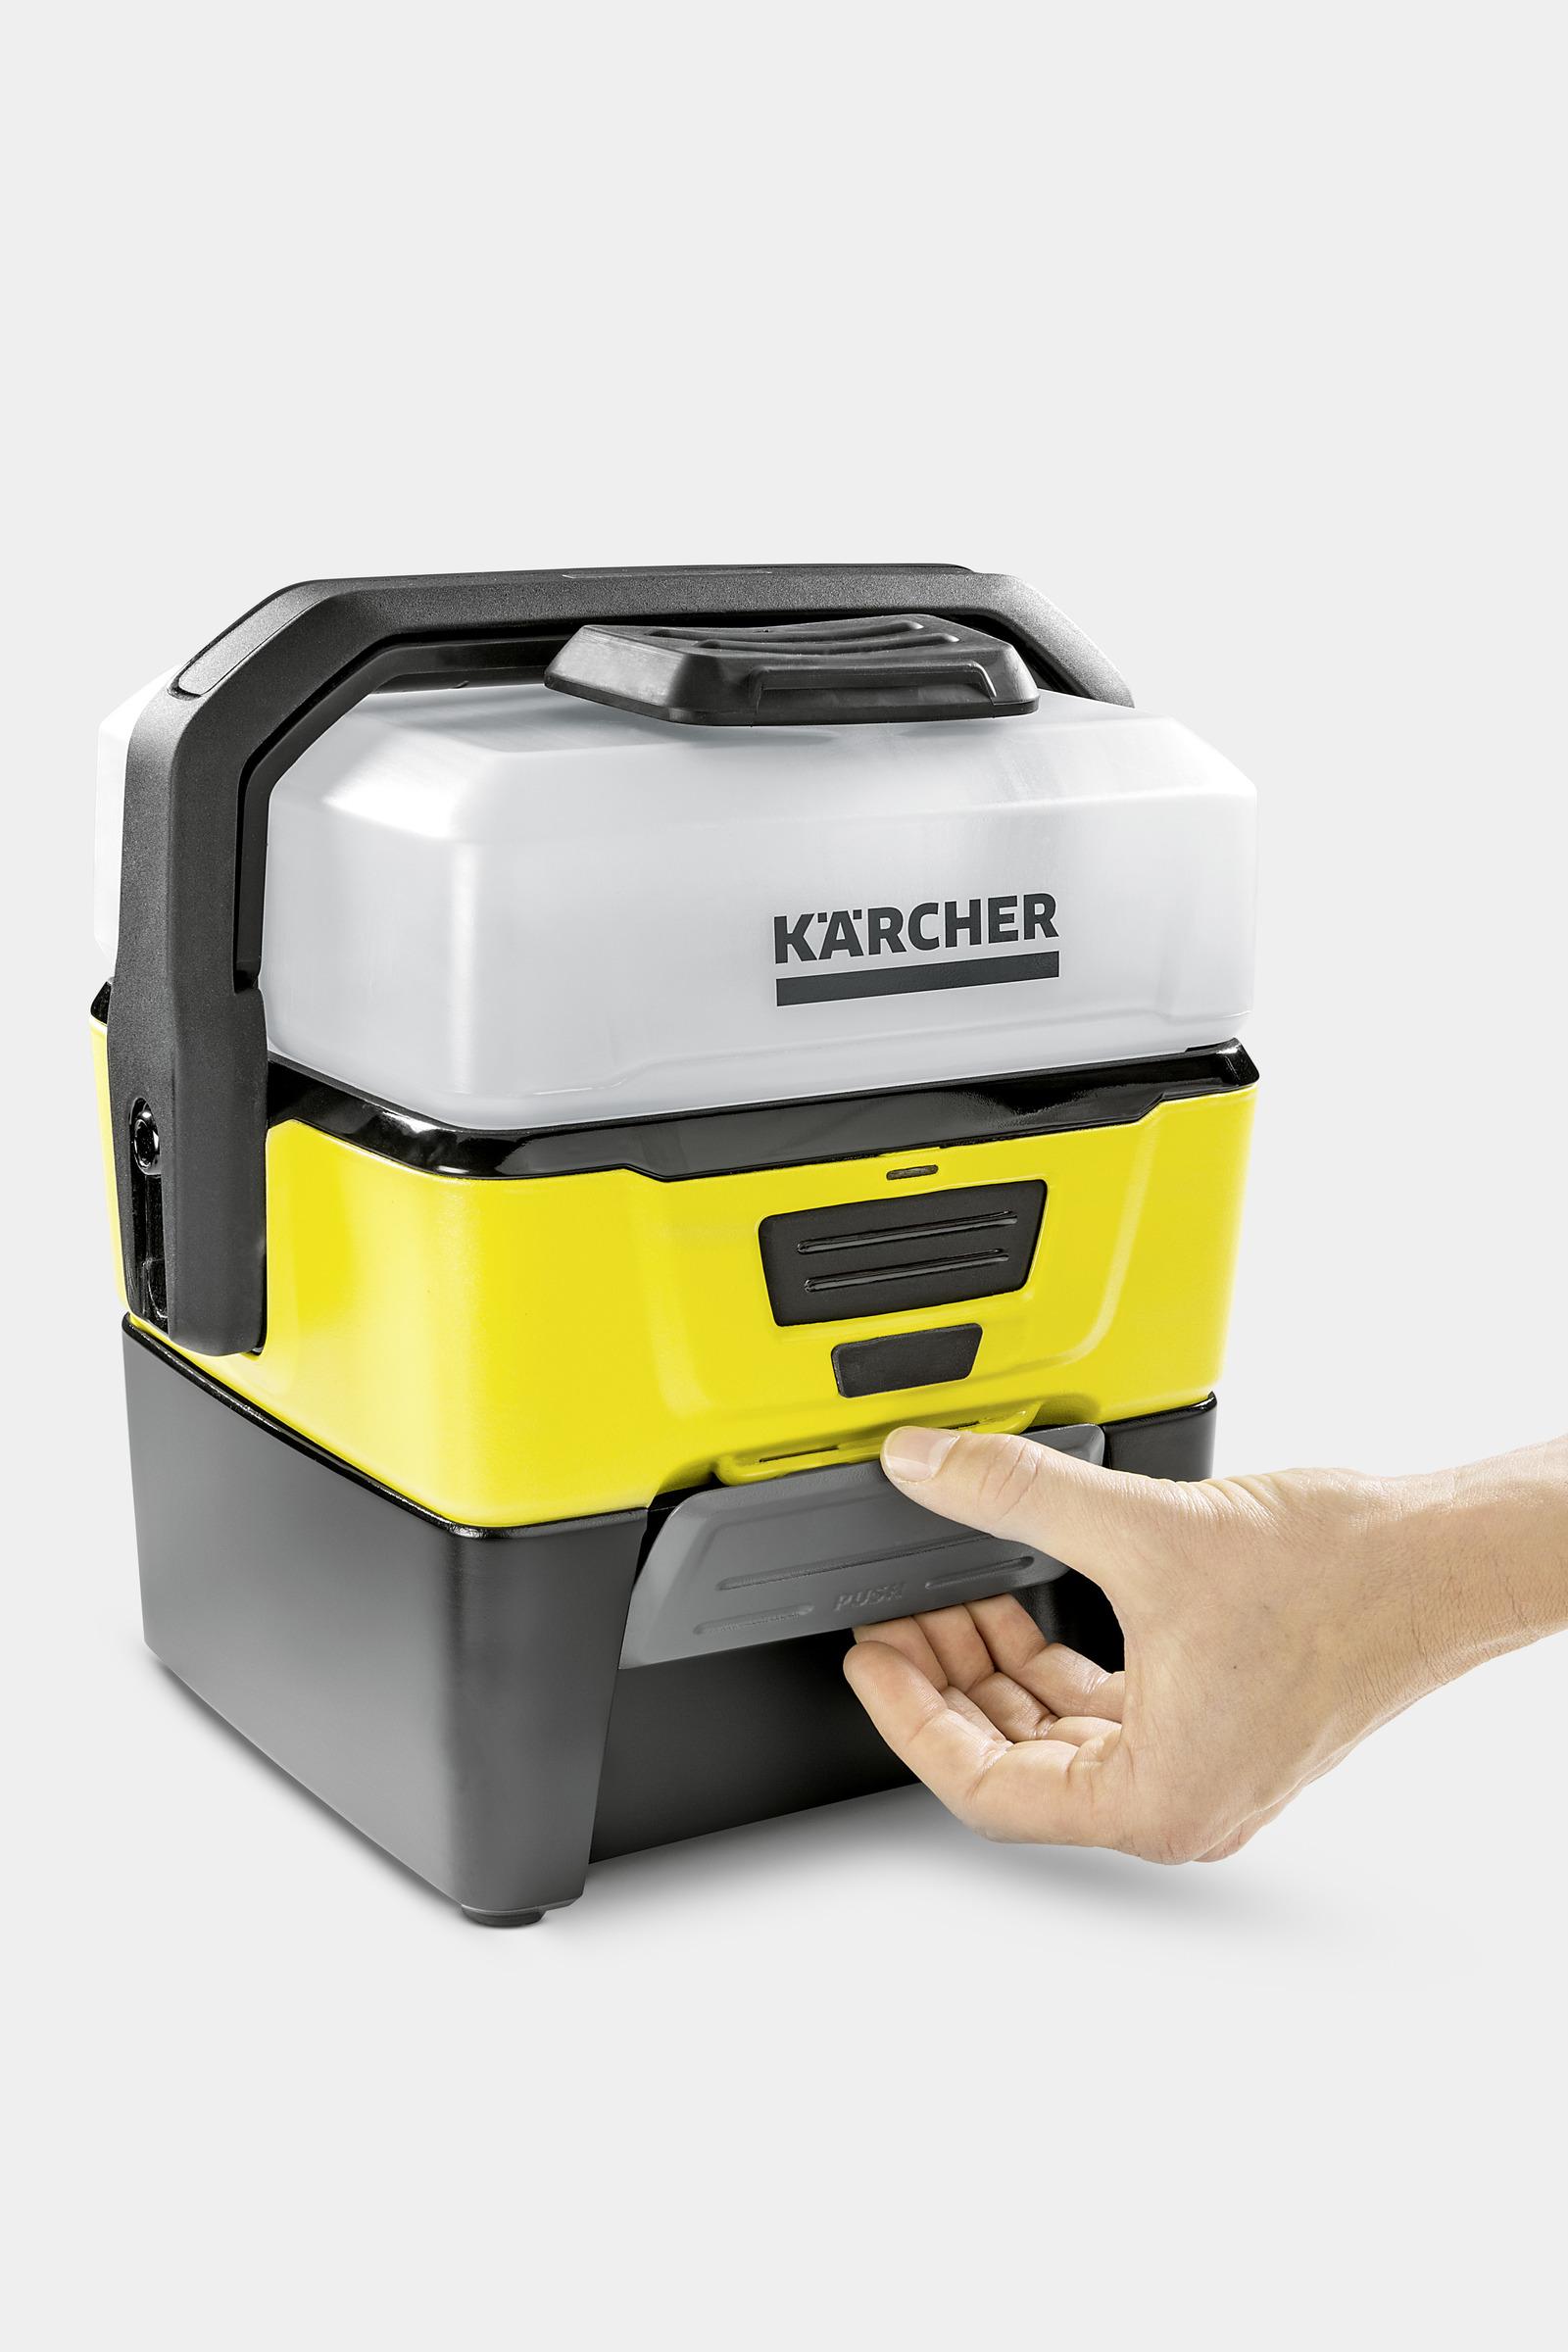 Mobile outdoor cleaner nettoyeur mobile ext rieur box v lo for Karcher exterieur